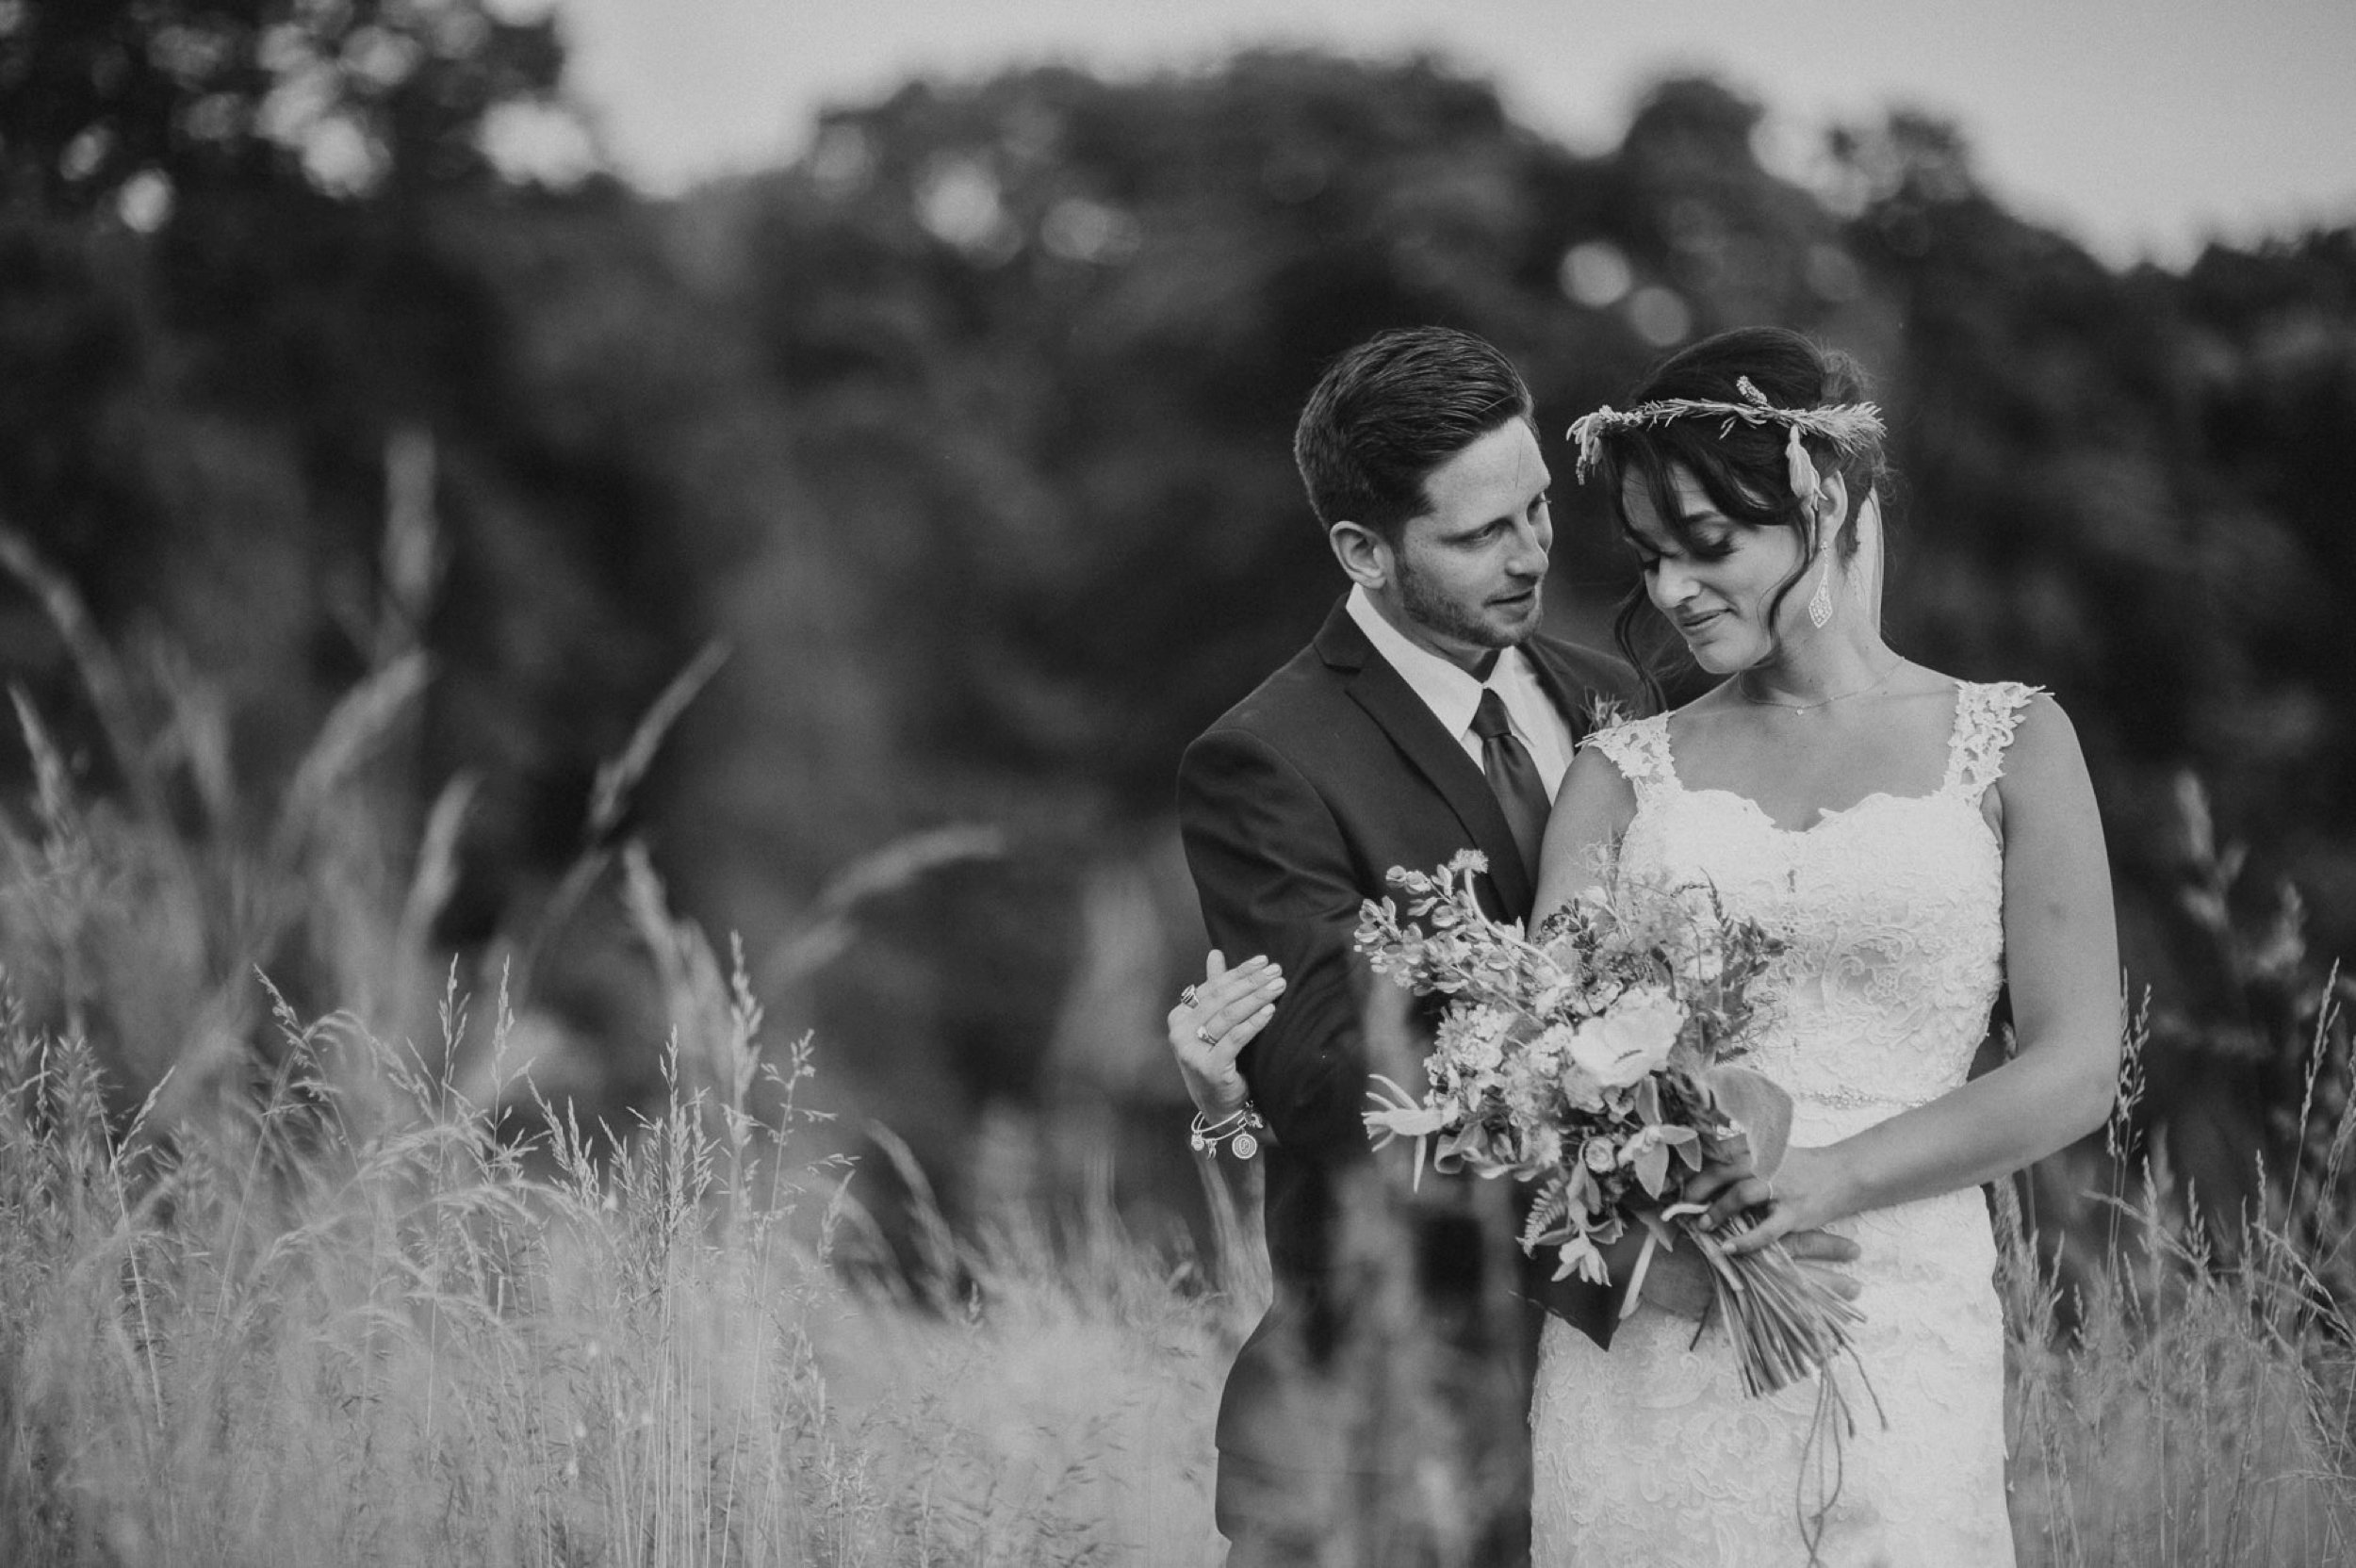 milburn_farms-wedding-74.jpg